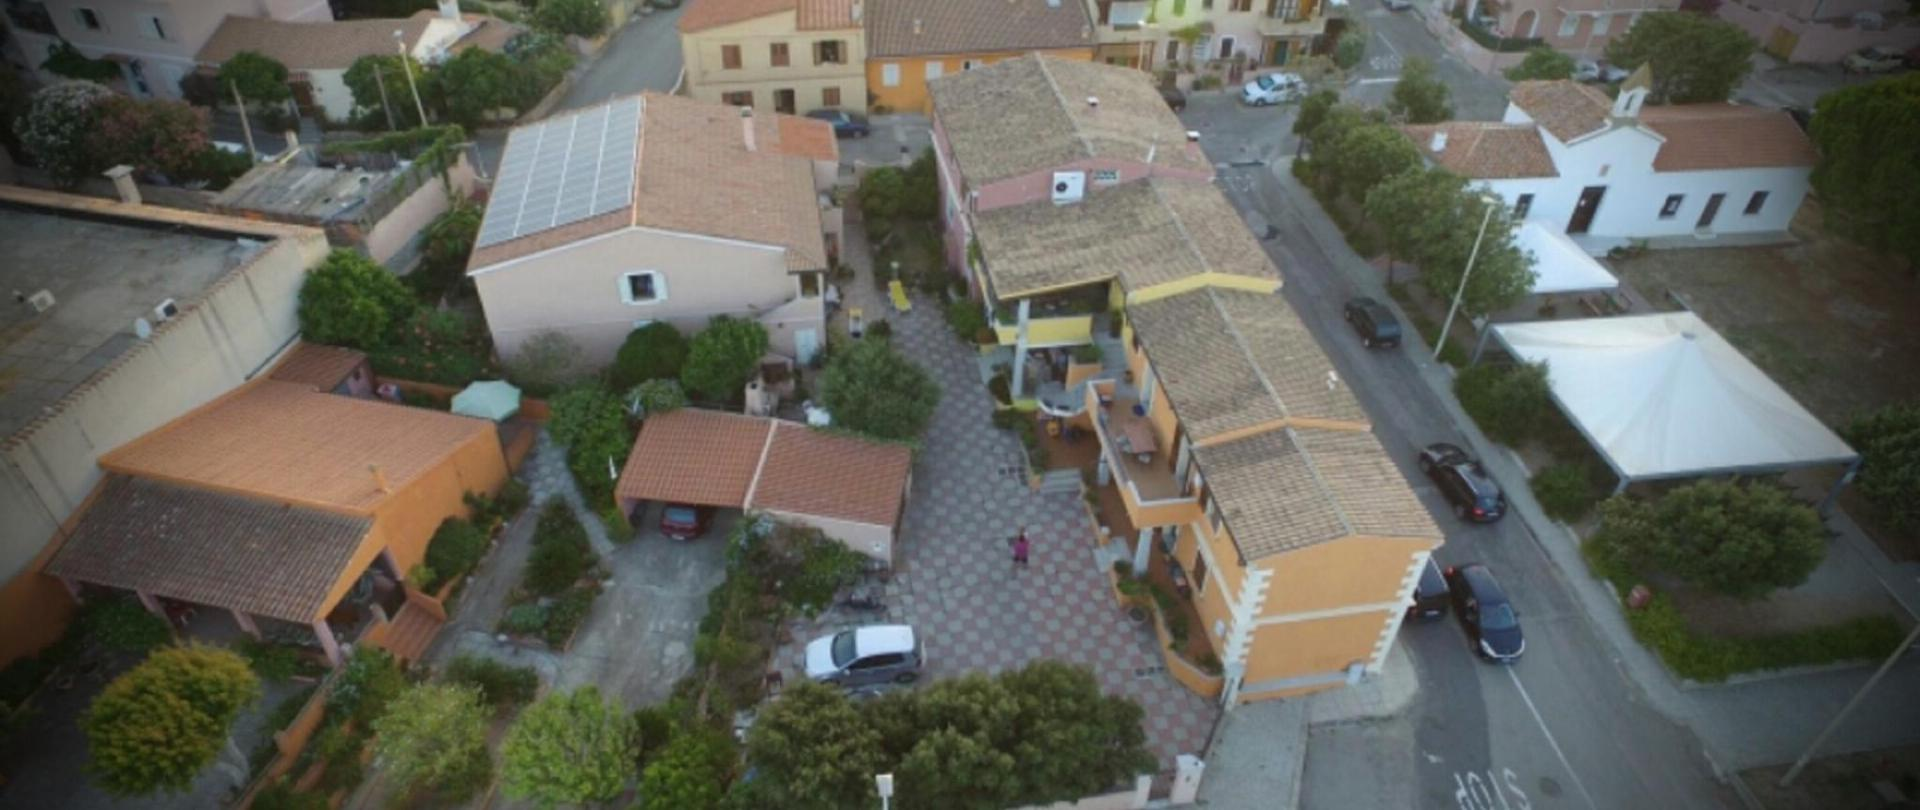 Panoramica Corte Mannoni.jpg